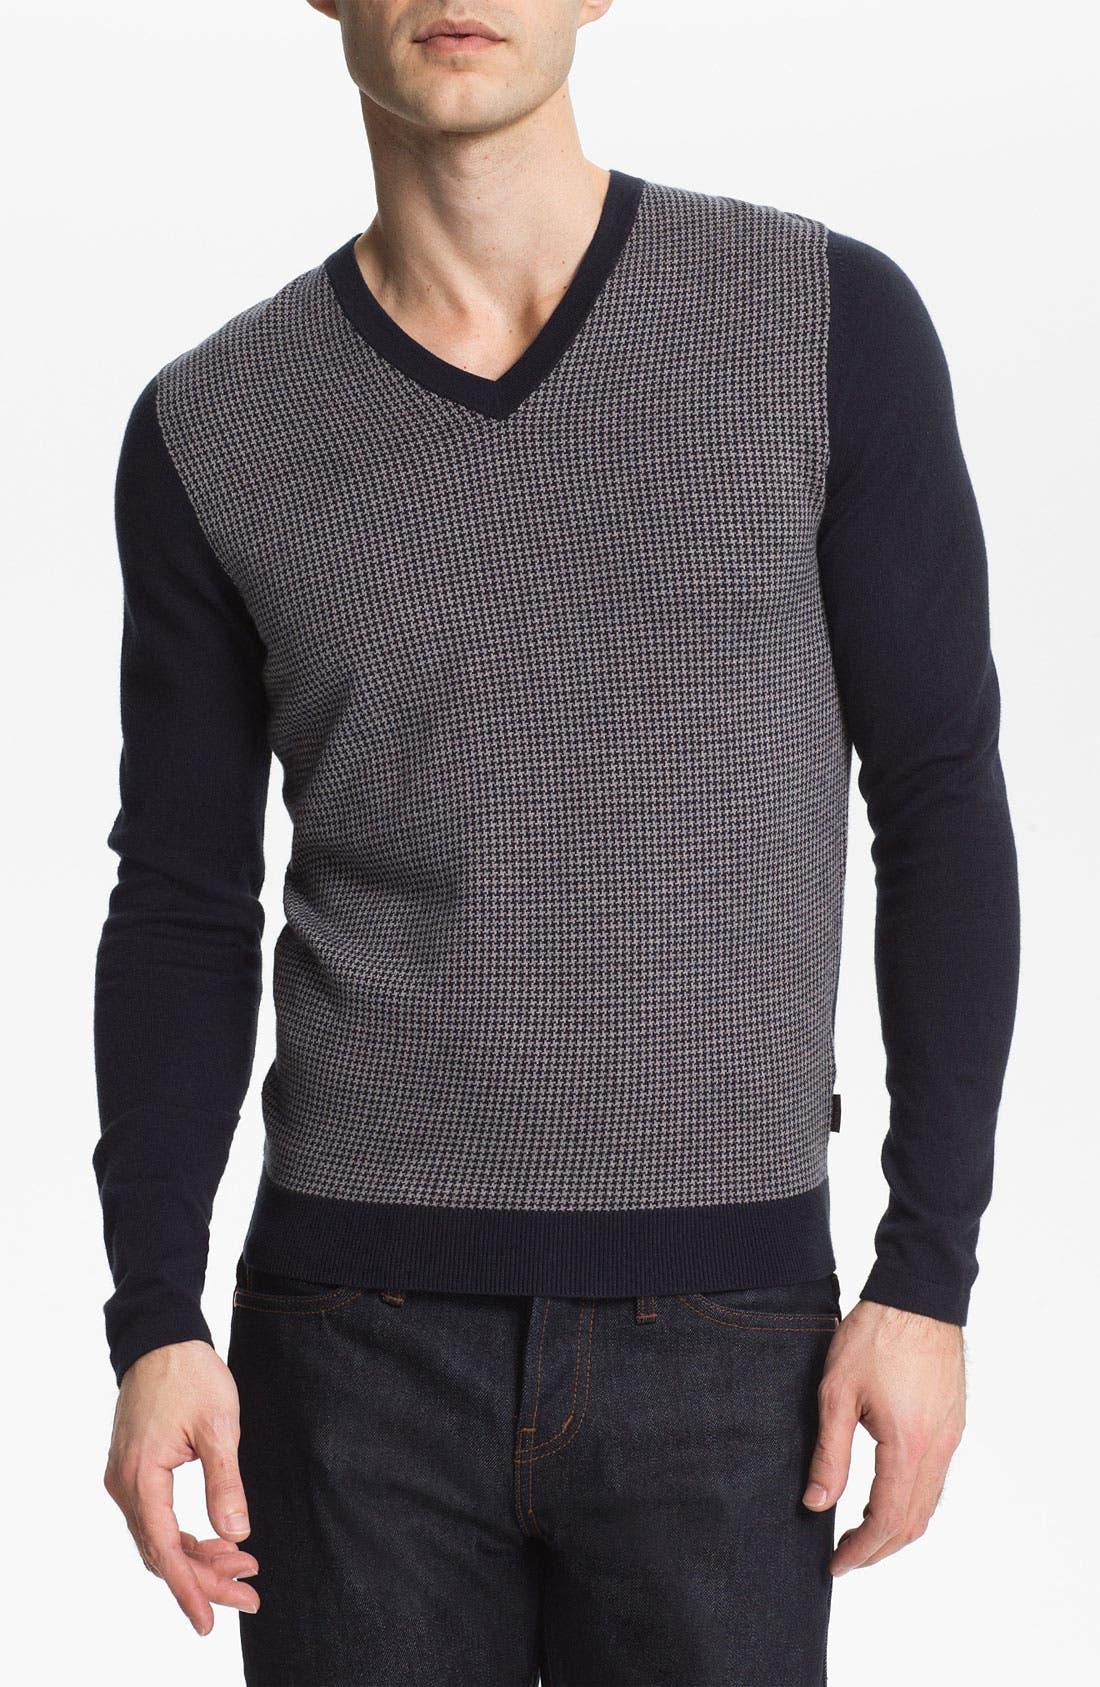 Main Image - BOSS Black 'Garvin' Trim Fit V-Neck Sweater